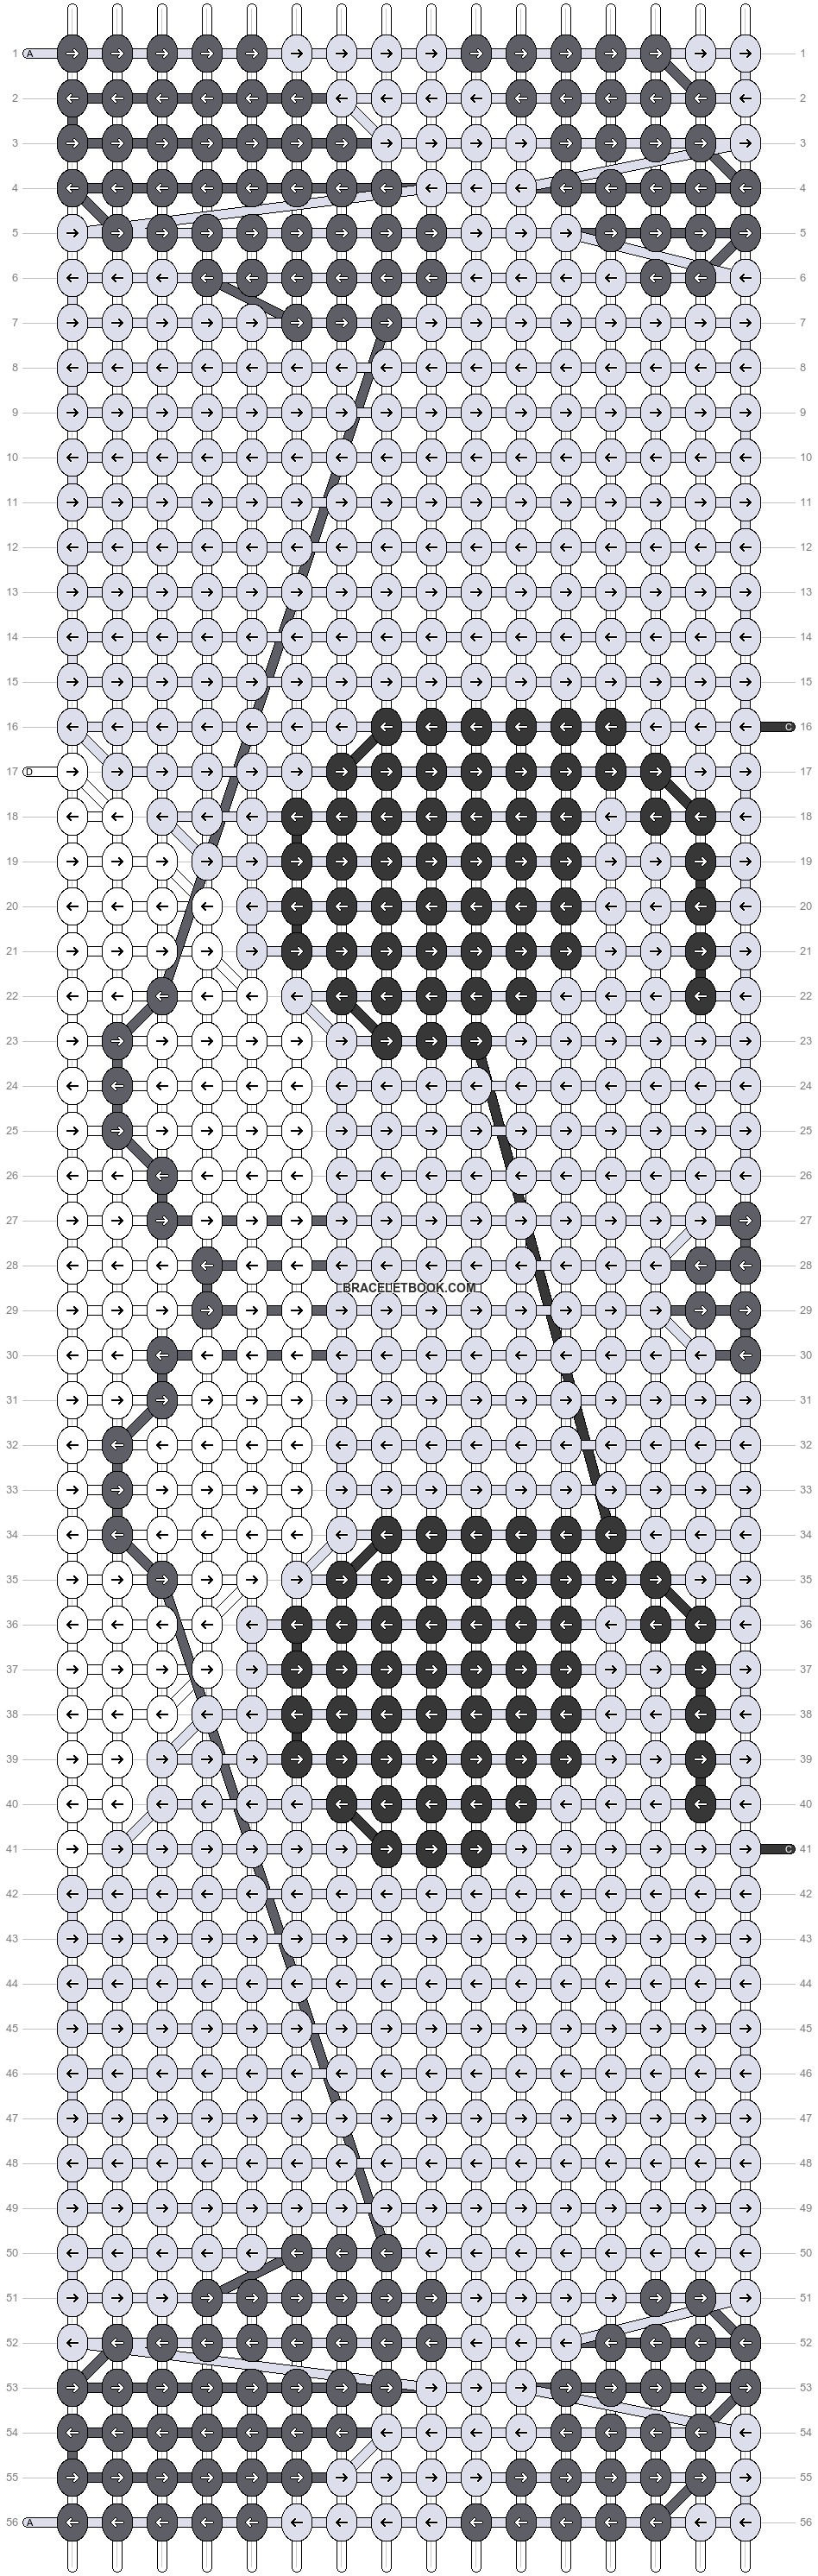 Alpha pattern #15044 pattern